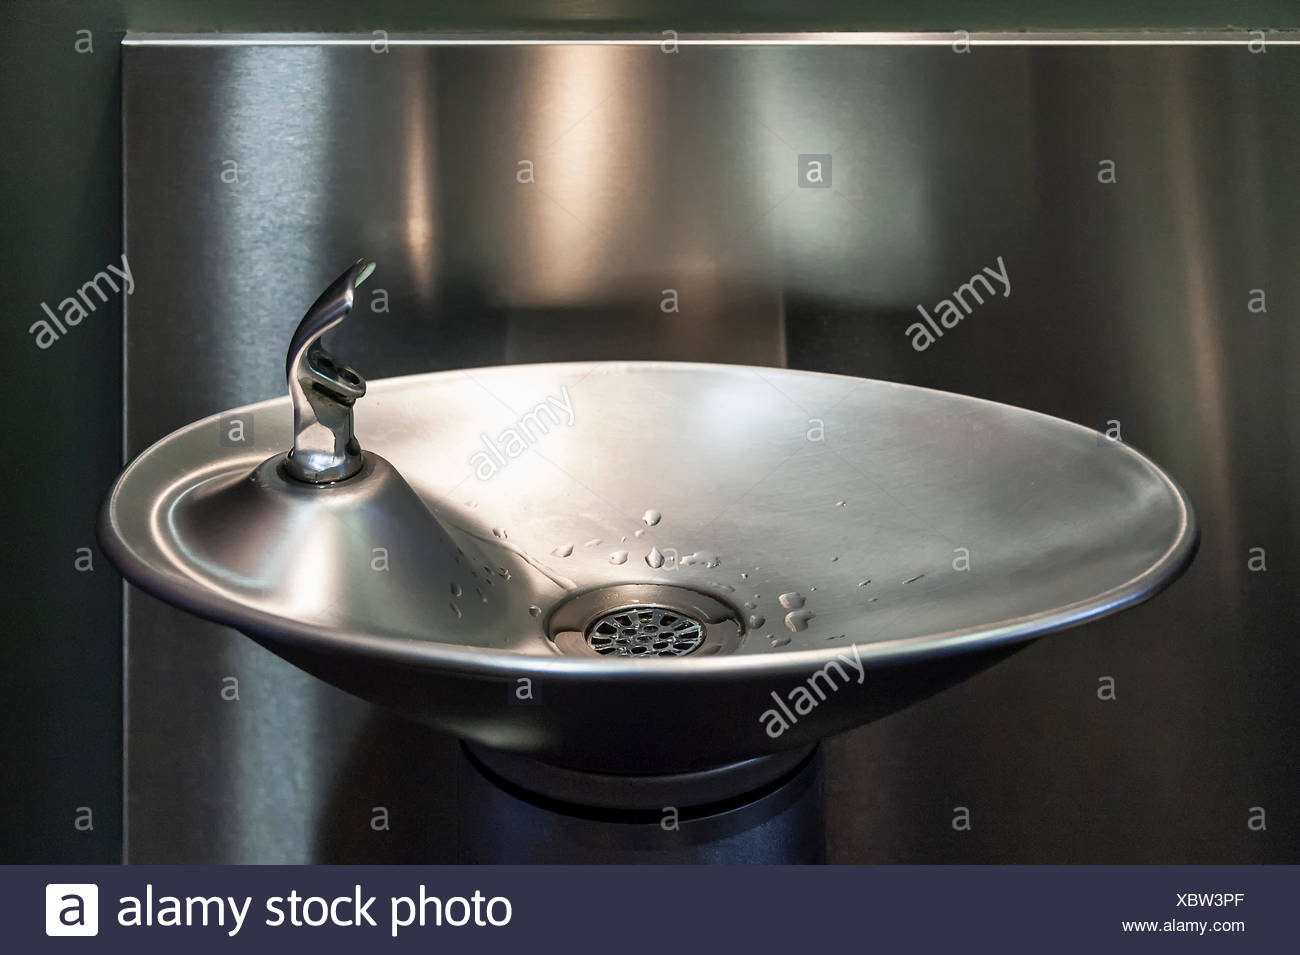 Fuente de agua de diseño moderno. Imagen De Stock